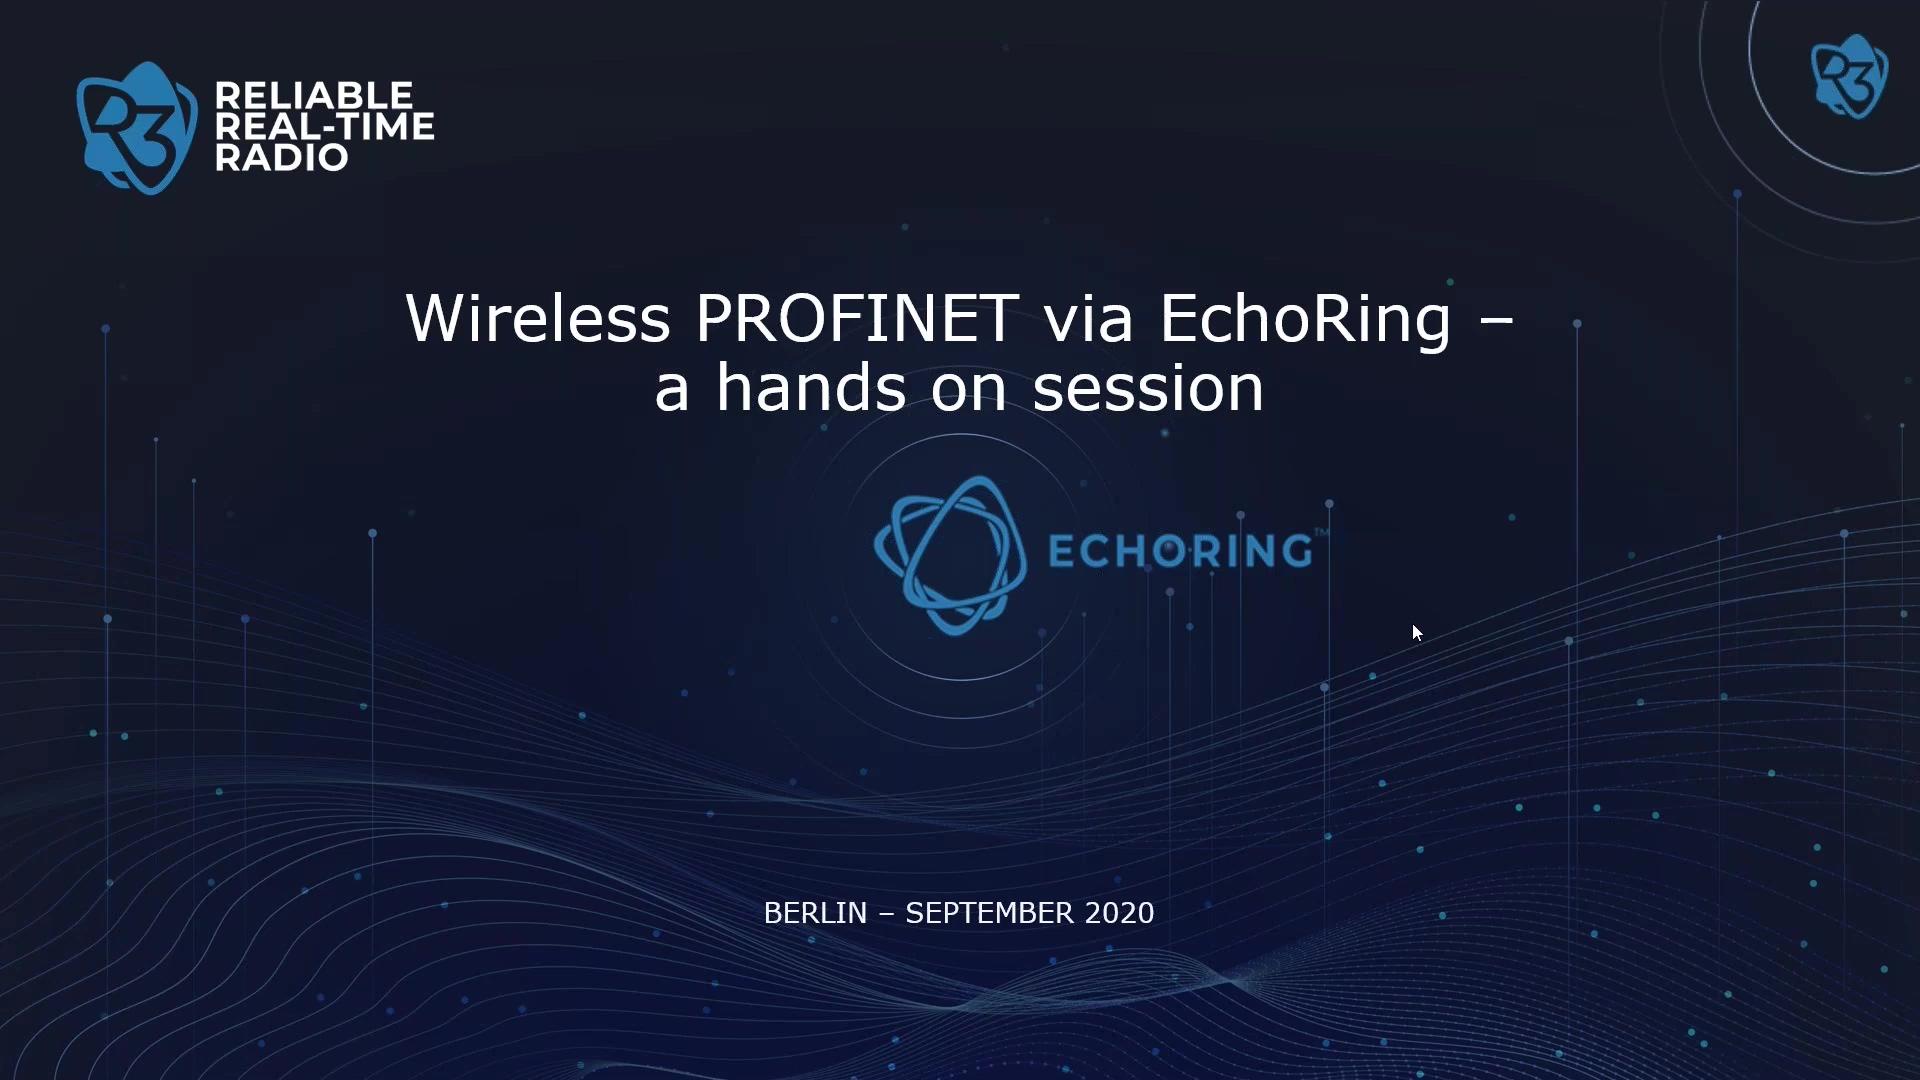 EchoRing PROFINET Hands-On Session (DE)